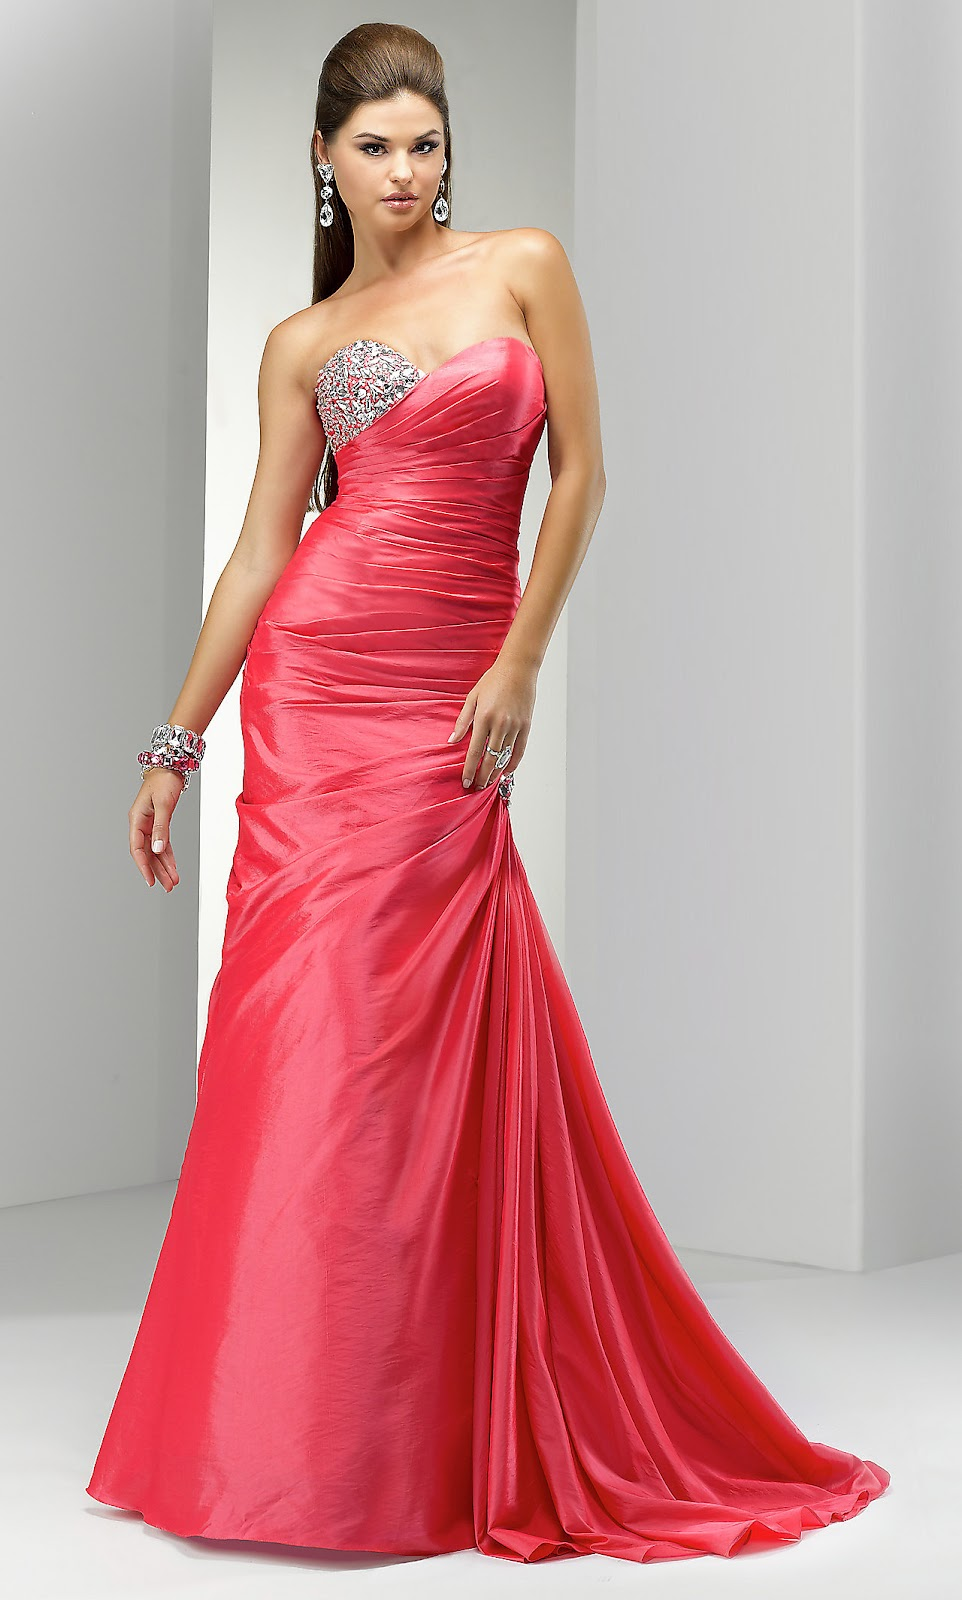 Latest Fashion Collection: Fuchsia Party Dresses